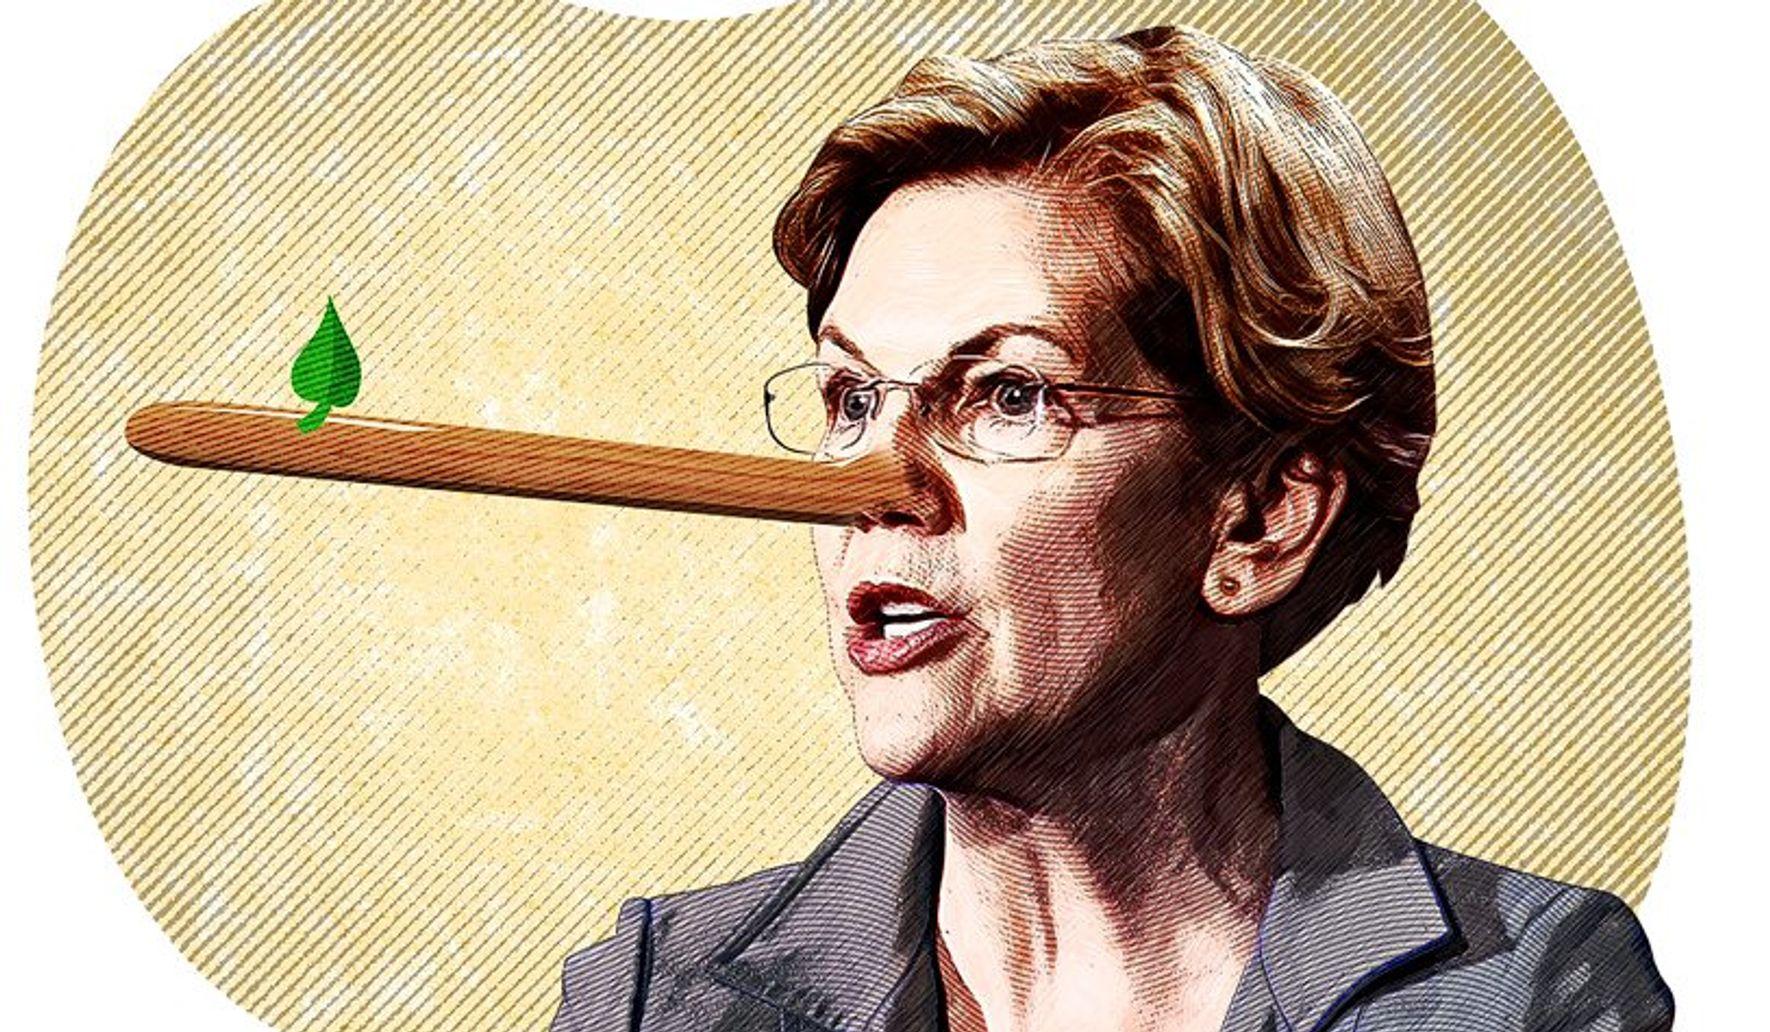 Sen. Elizabeth Warren's worst lie